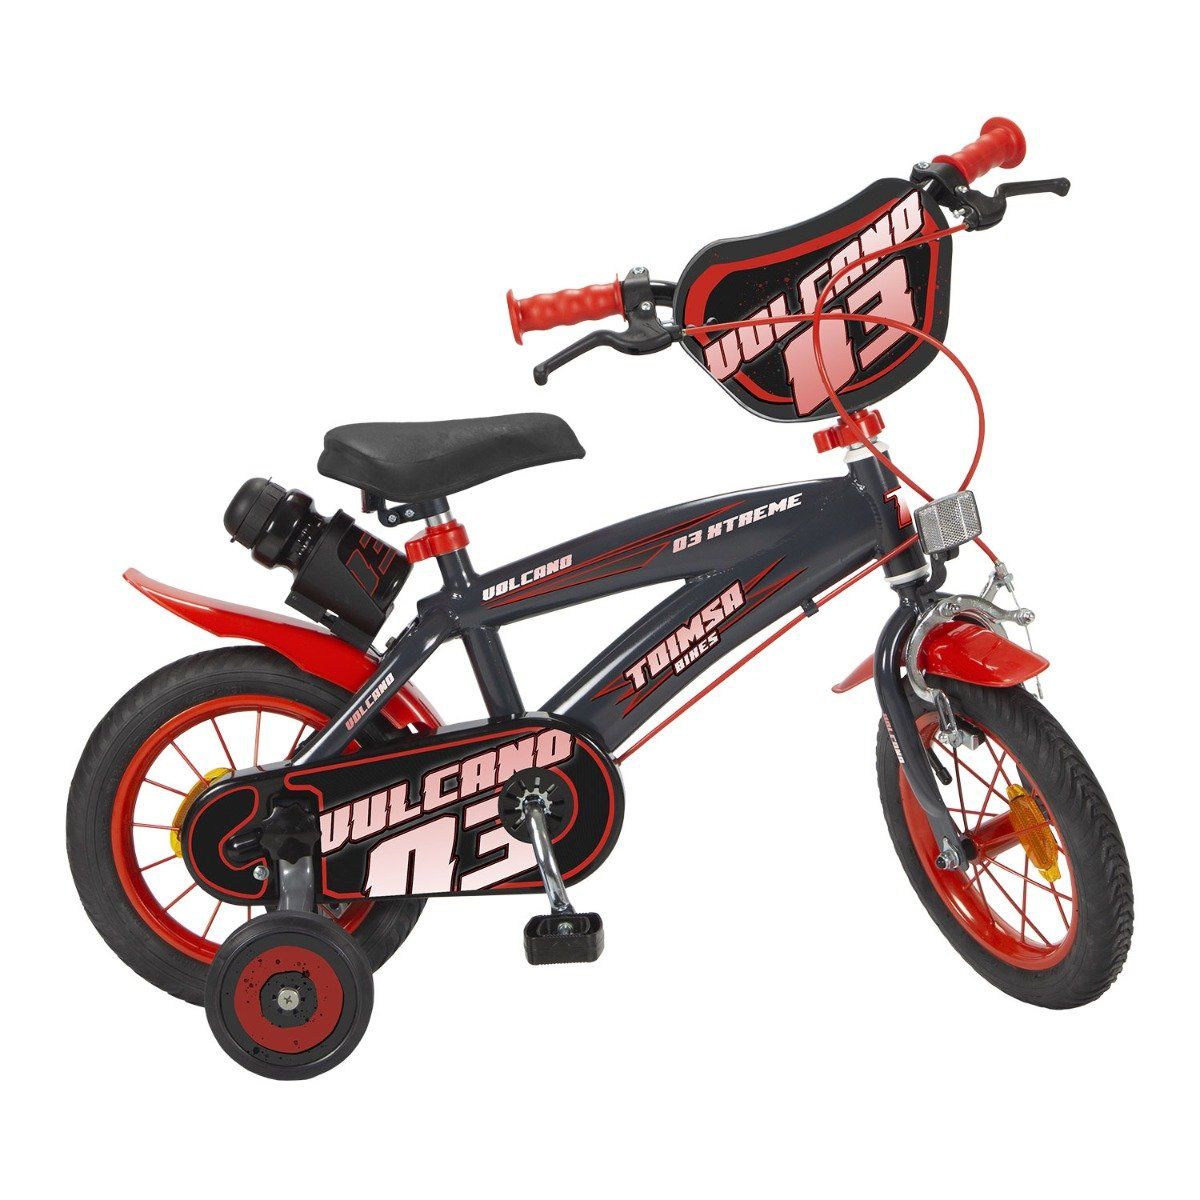 Bicicleta copii Toimsa Vulcano, 12 inch